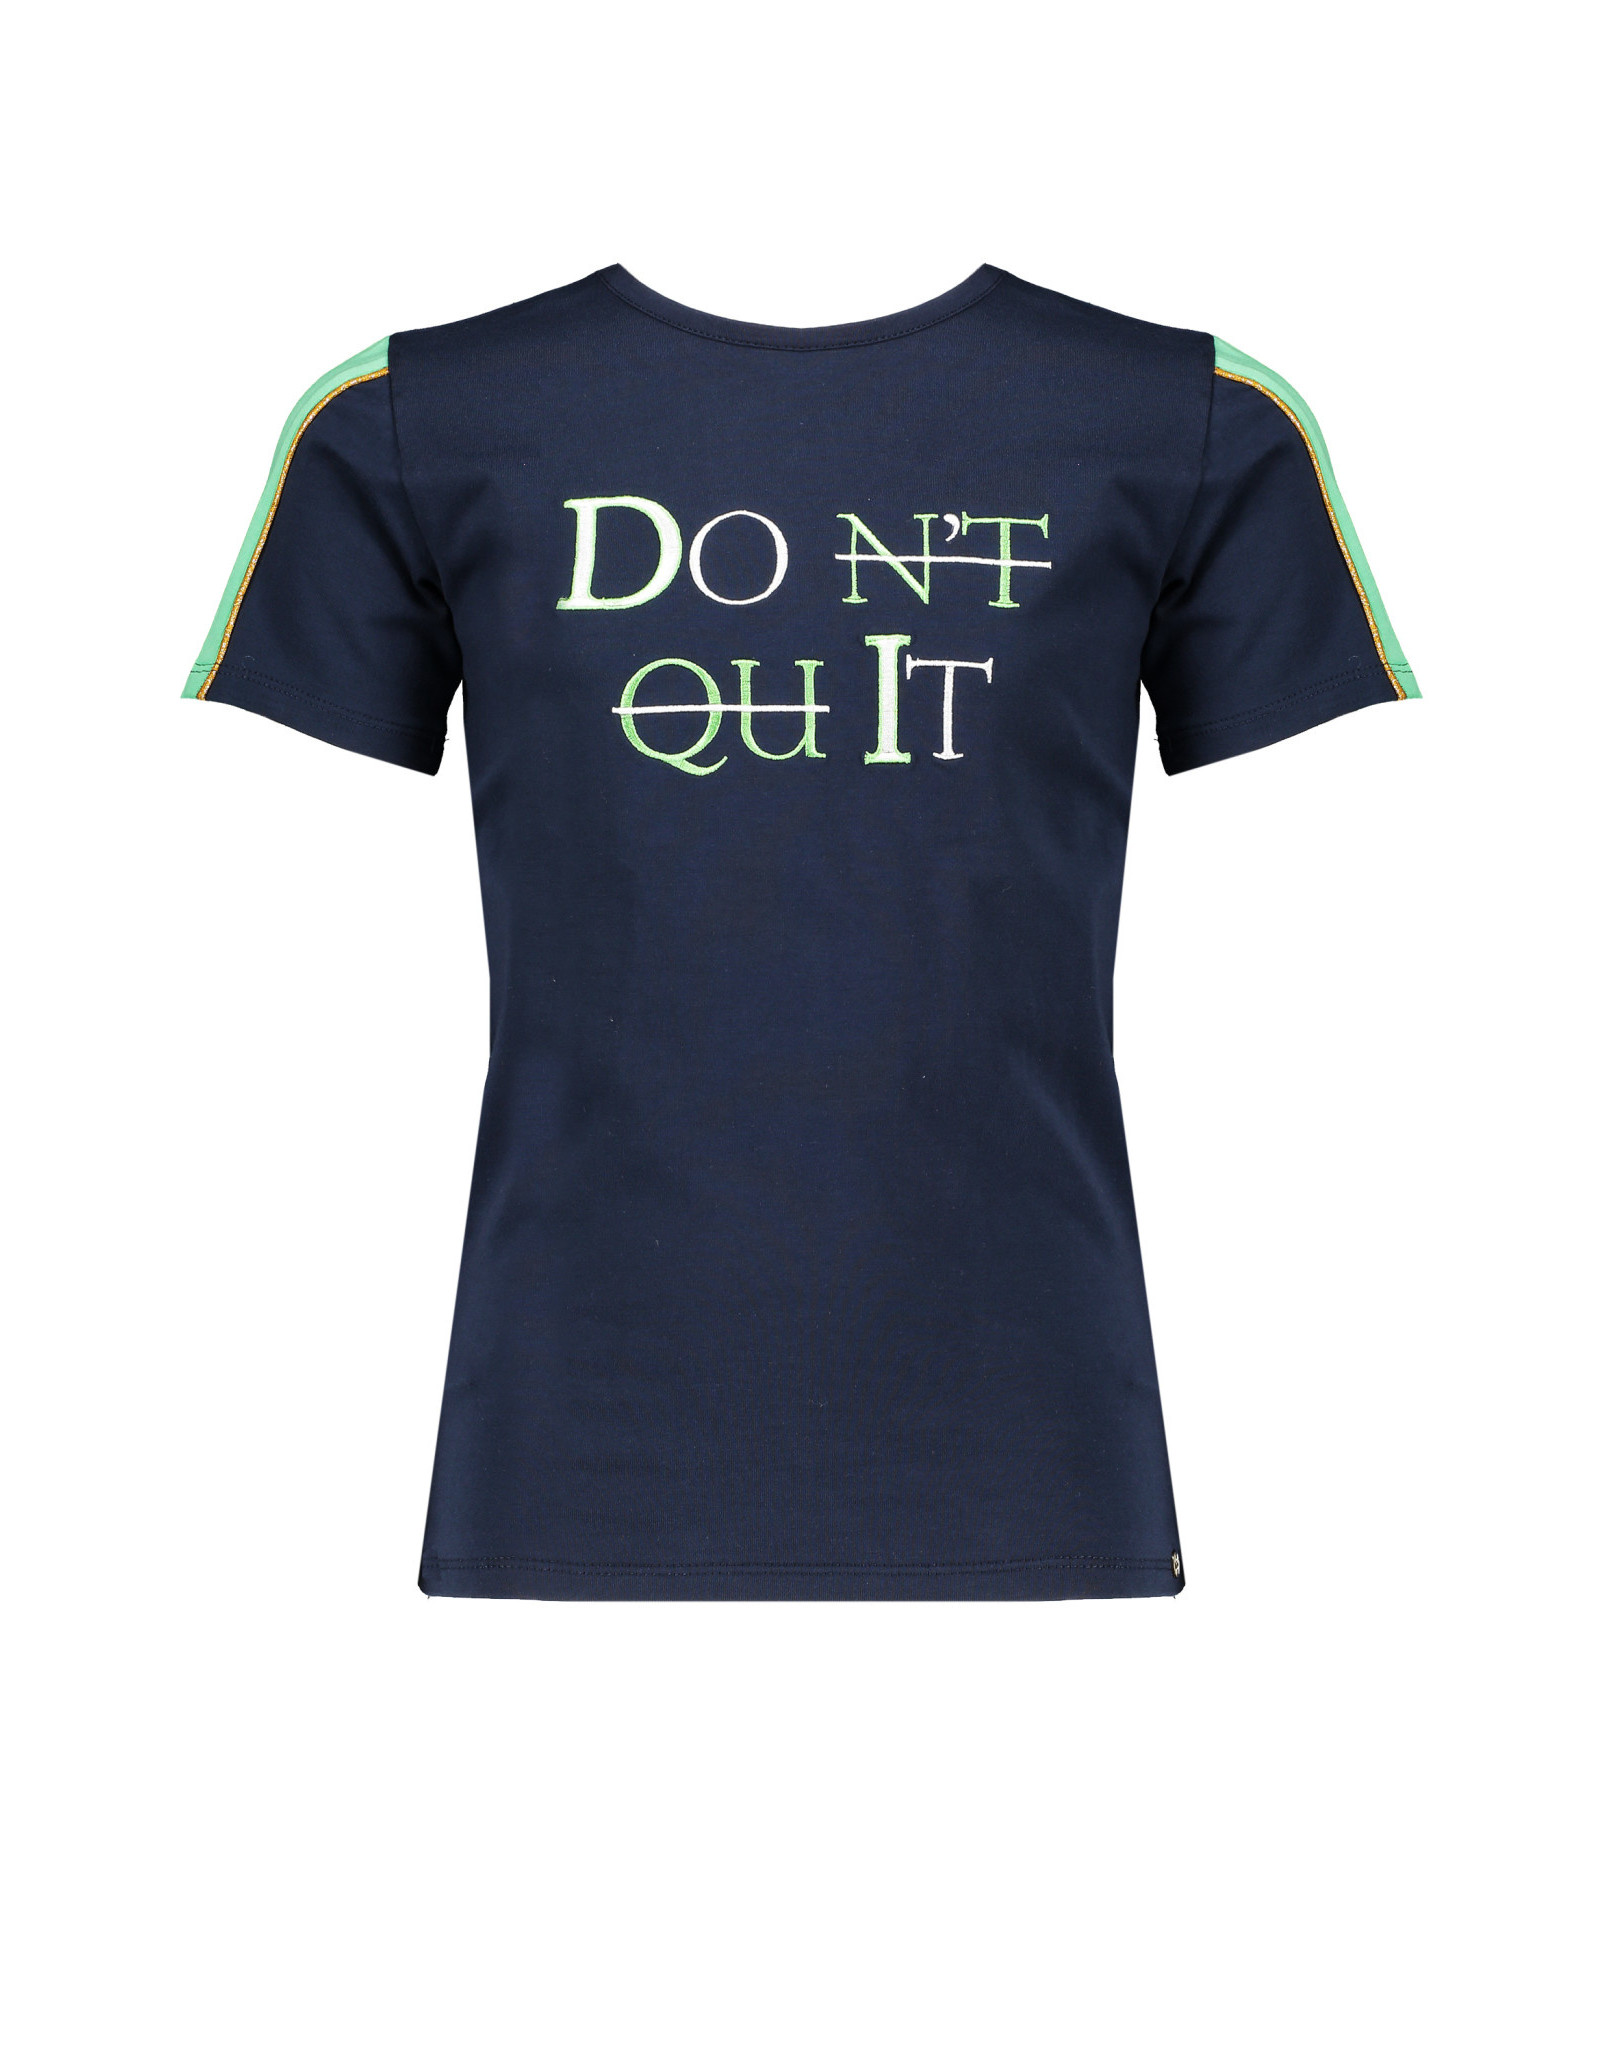 NoBell NoBell meiden t-shirt DON'T QUIT Kulian Grey Navy